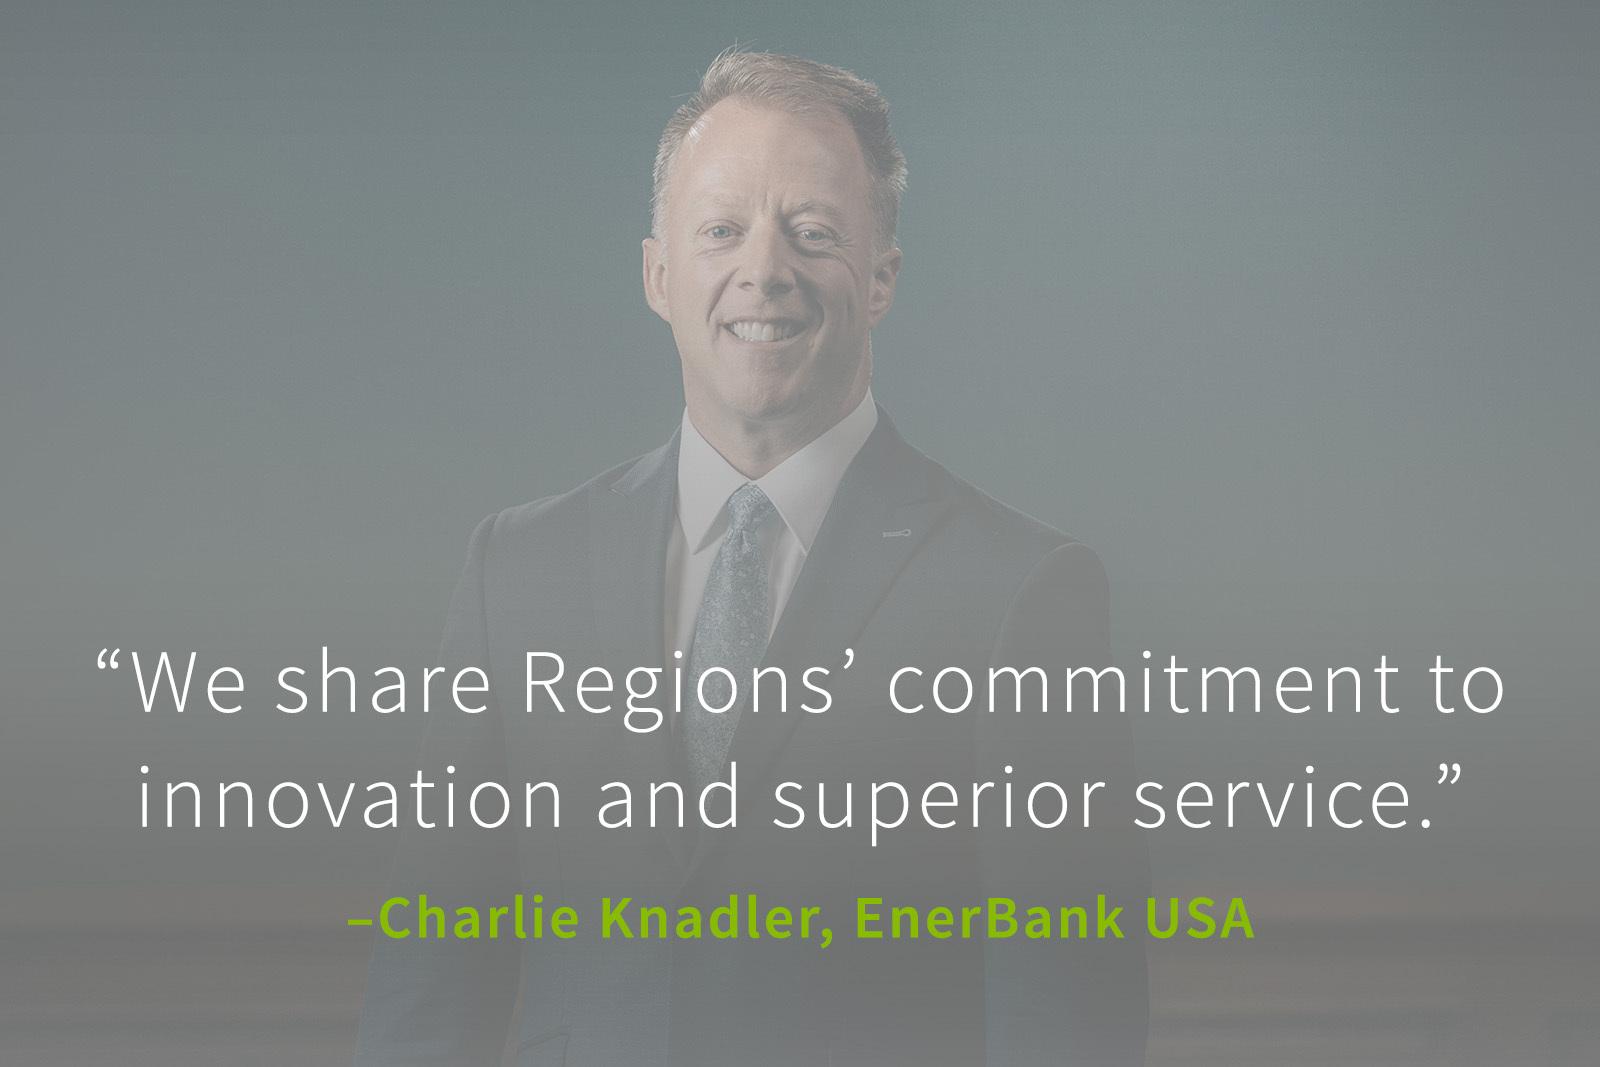 Charlie Knadler Quote